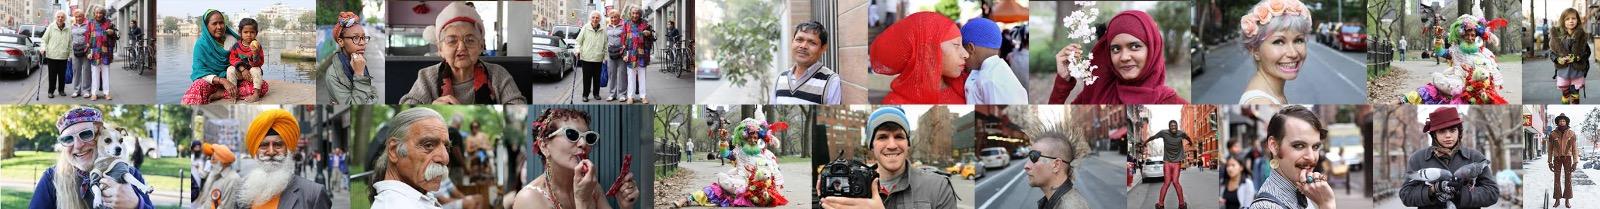 Humans of New York in Bangladesh